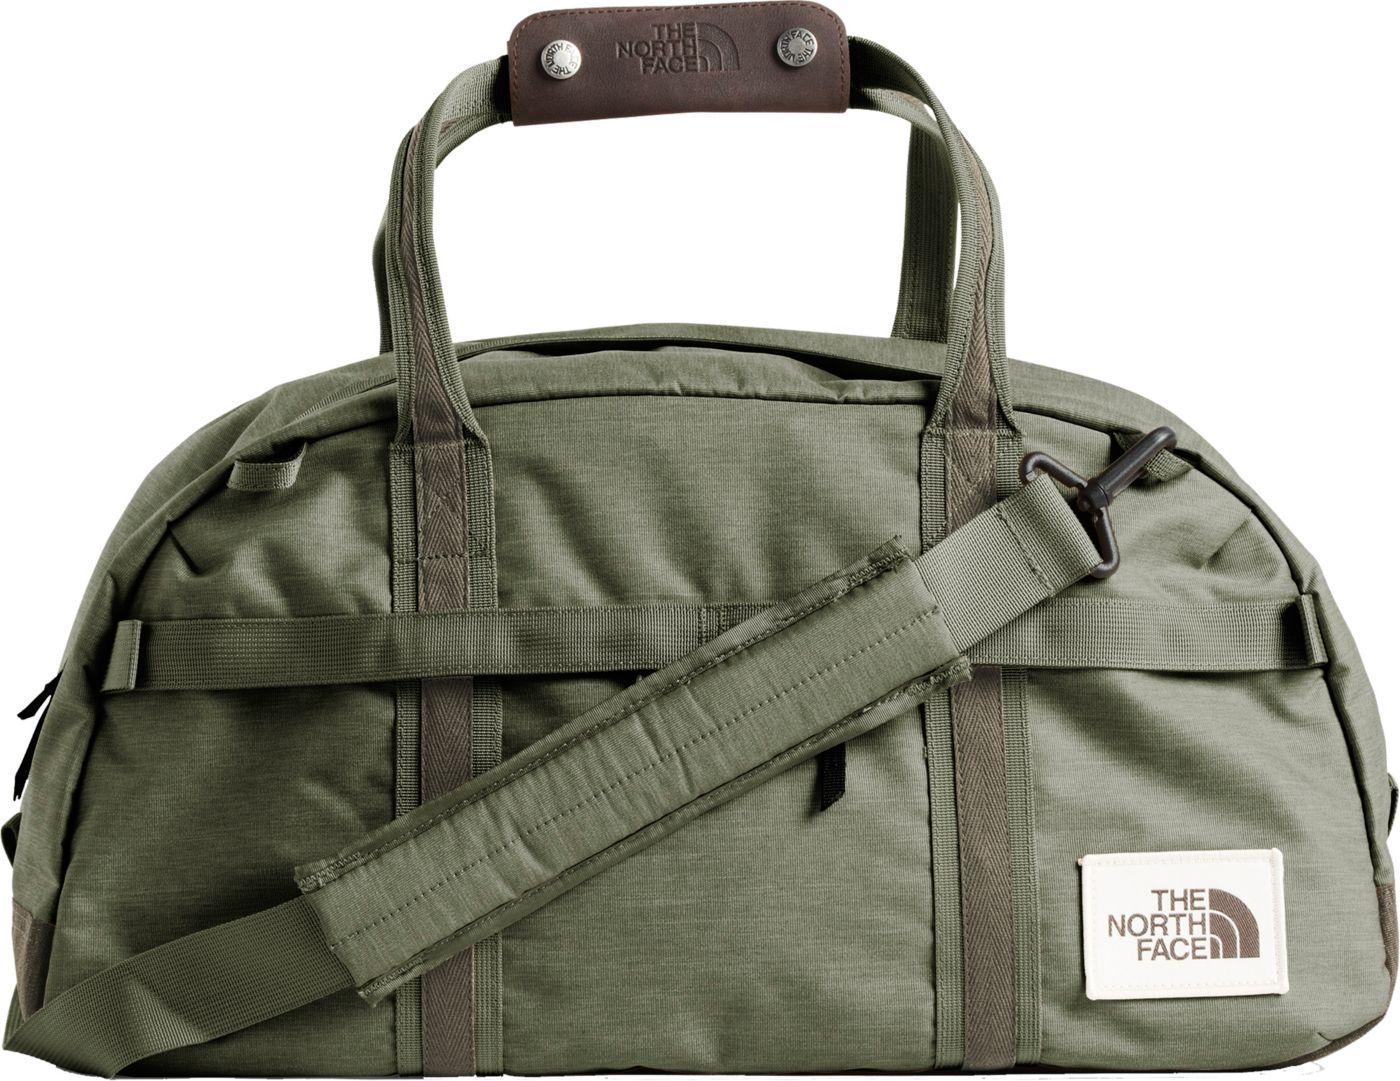 The North Face Small Berkeley Duffle Bag